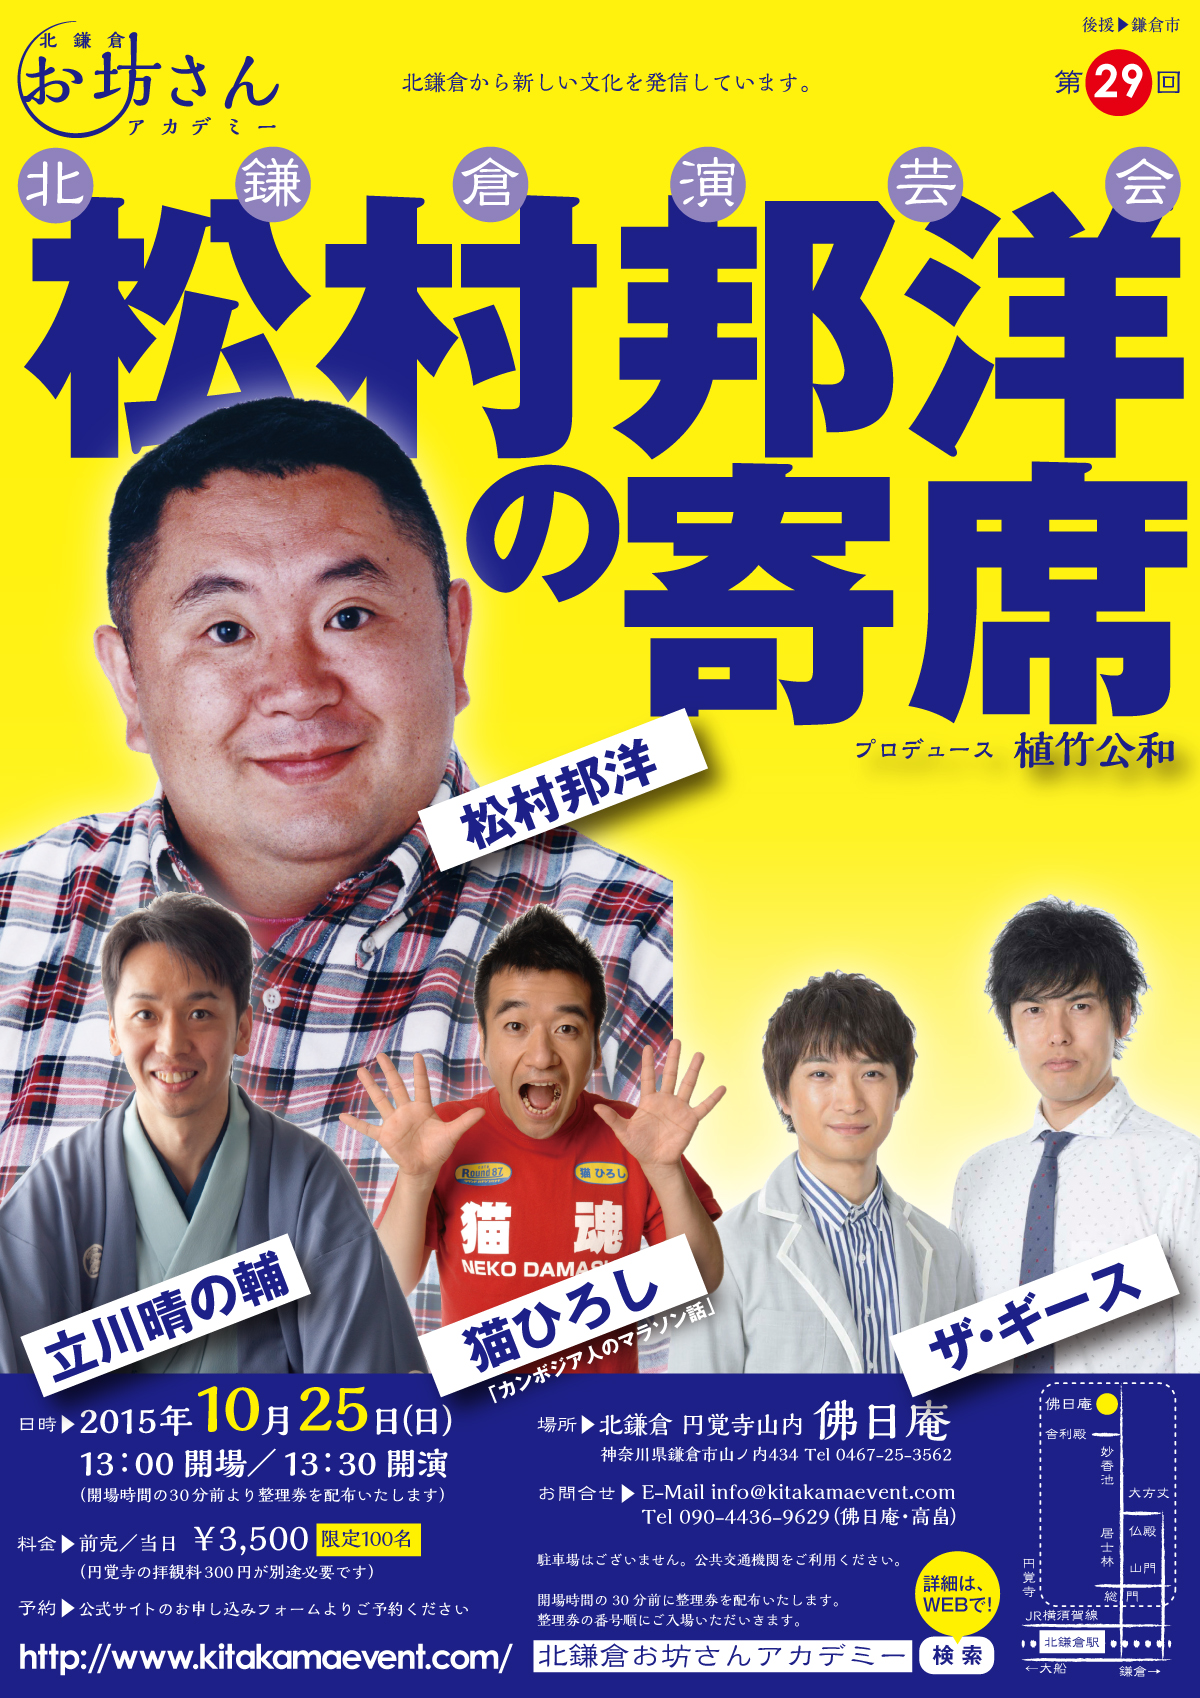 Vol.29【北鎌倉演芸会】松村邦洋の寄席